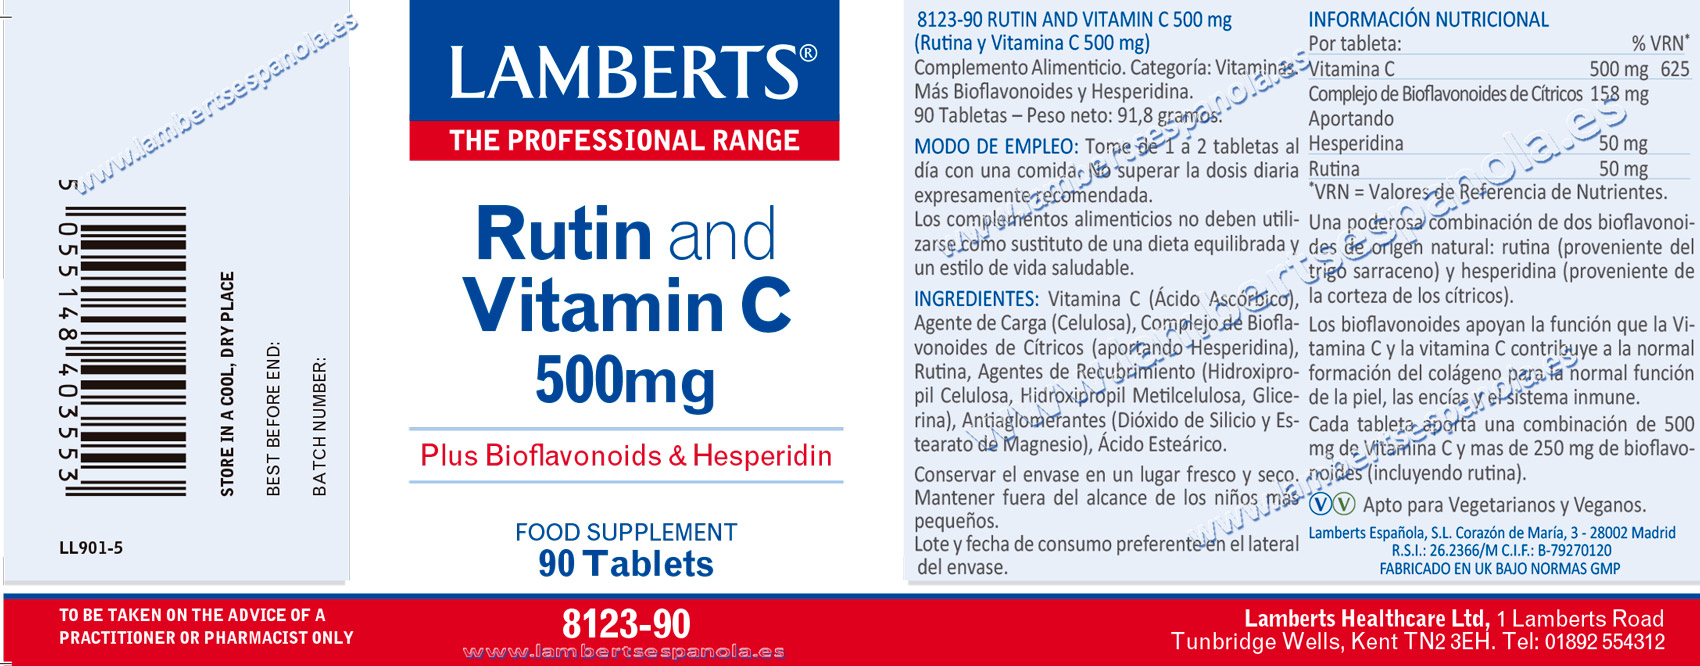 Rutina con Vitamina C